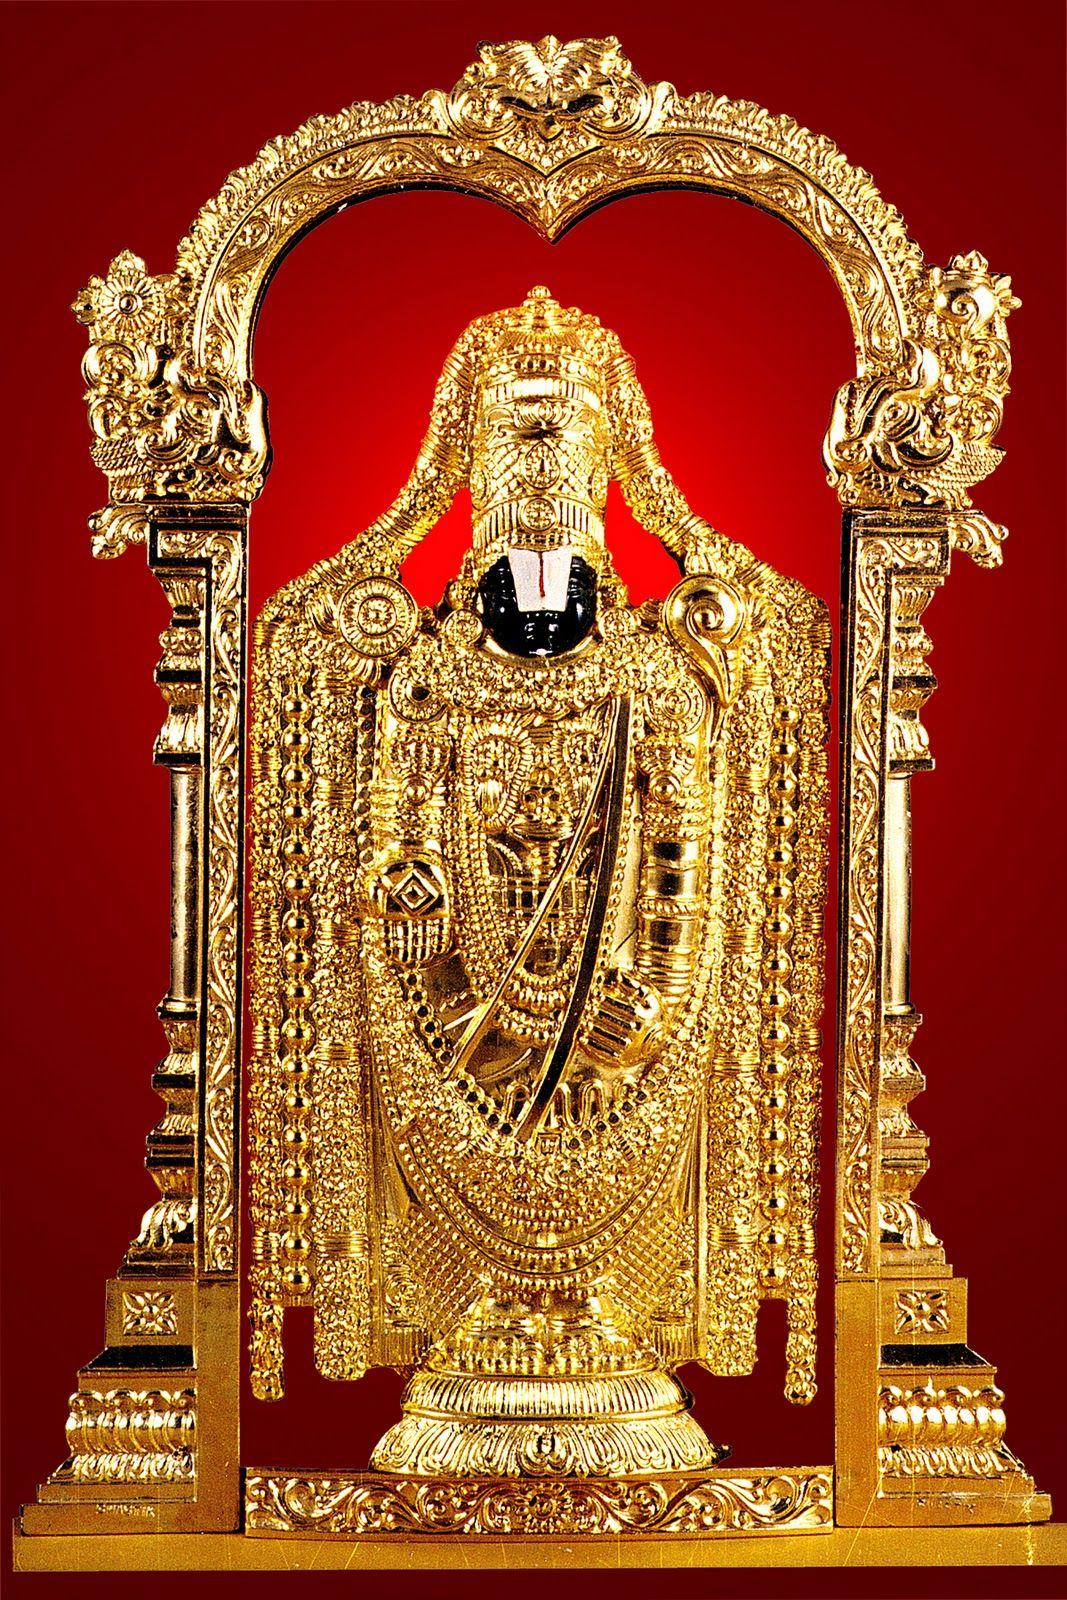 Lord Balaji Wallpapers Gallery Tirupati Balaji Hd Photos God Lord Shiva Hd Wallpaper Lord Vishnu Wallpapers Lord Balaji